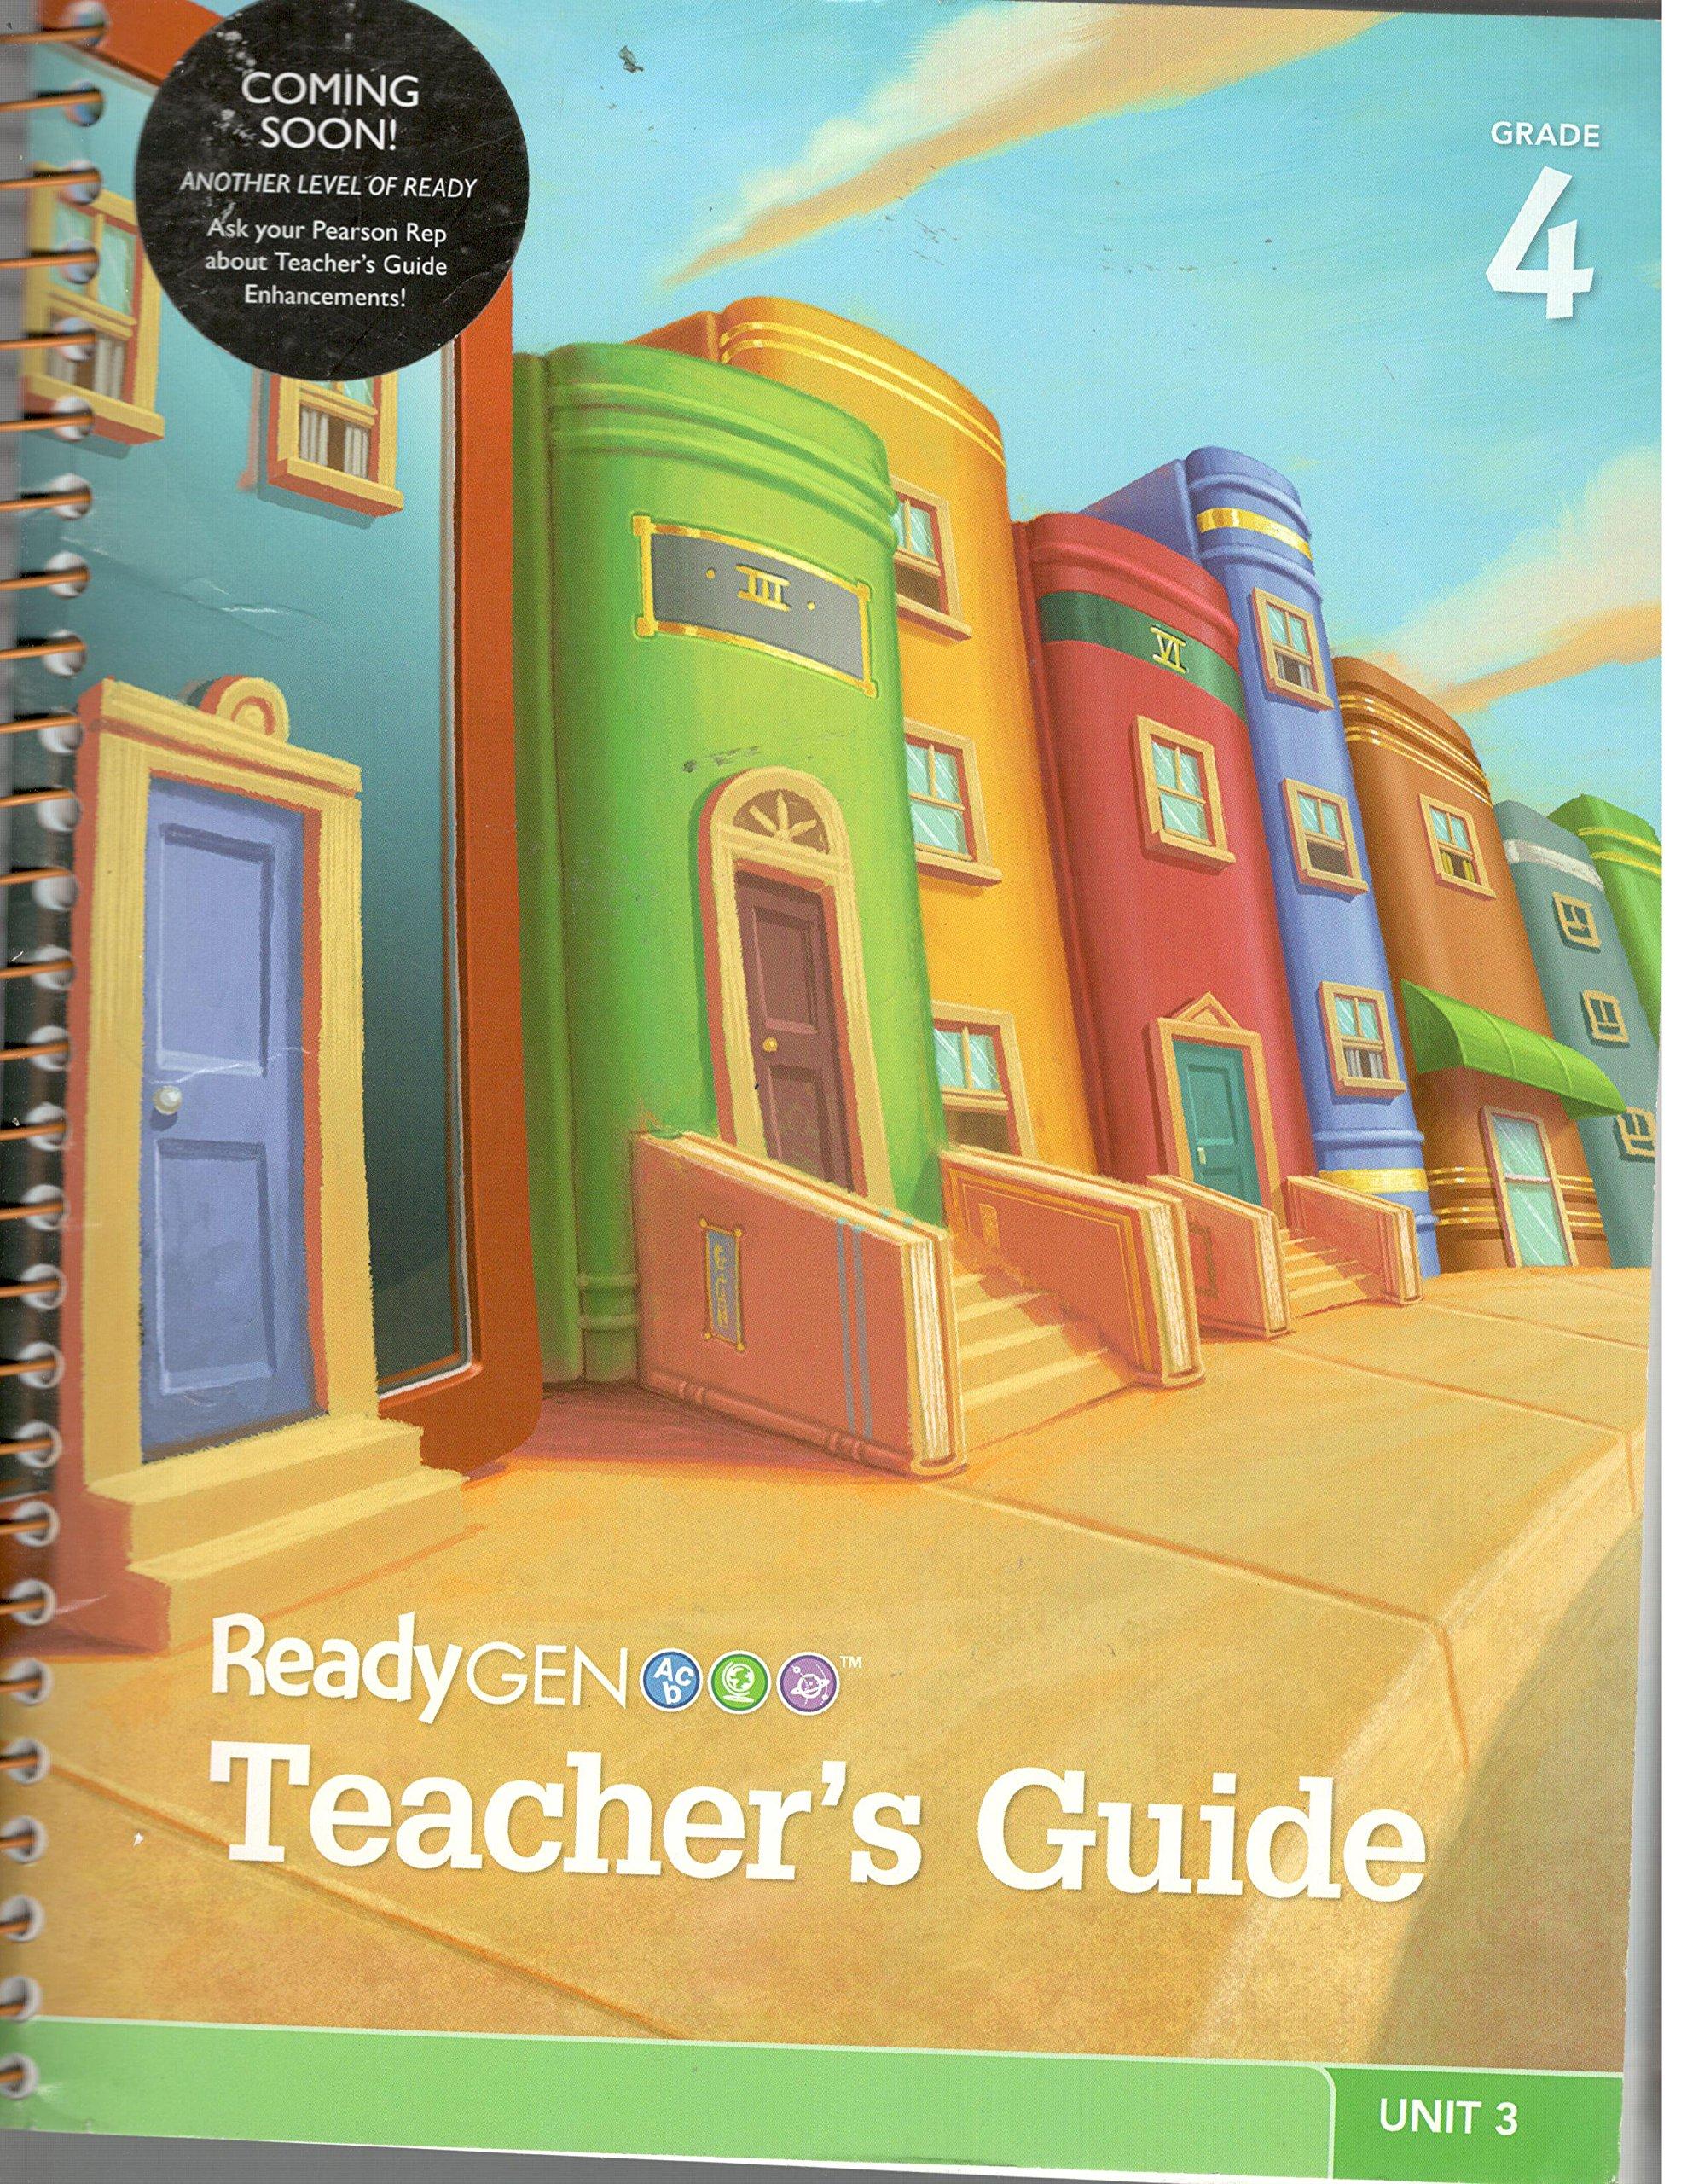 Readygen Teacher's Guide Grade 4 Unit 3 with Teachers Resources Section:  Pearson: 9780328818310: Amazon.com: Books